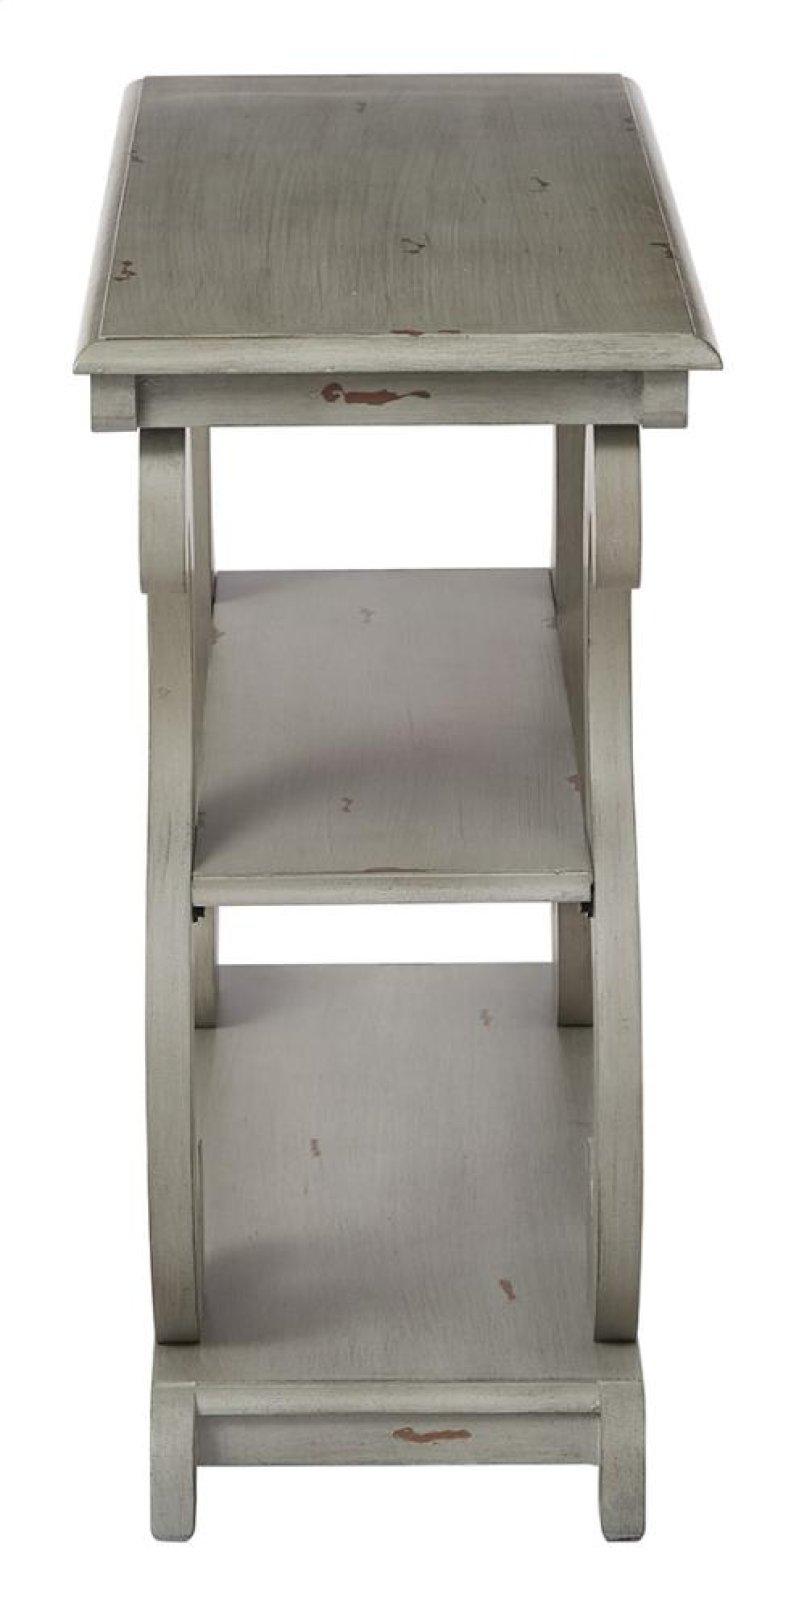 office star tillamook ashland console frjtdptkwolh avalon round accent table antique grey finish wrought iron outdoor furniture blue end pottery barn hammock cardboard navy